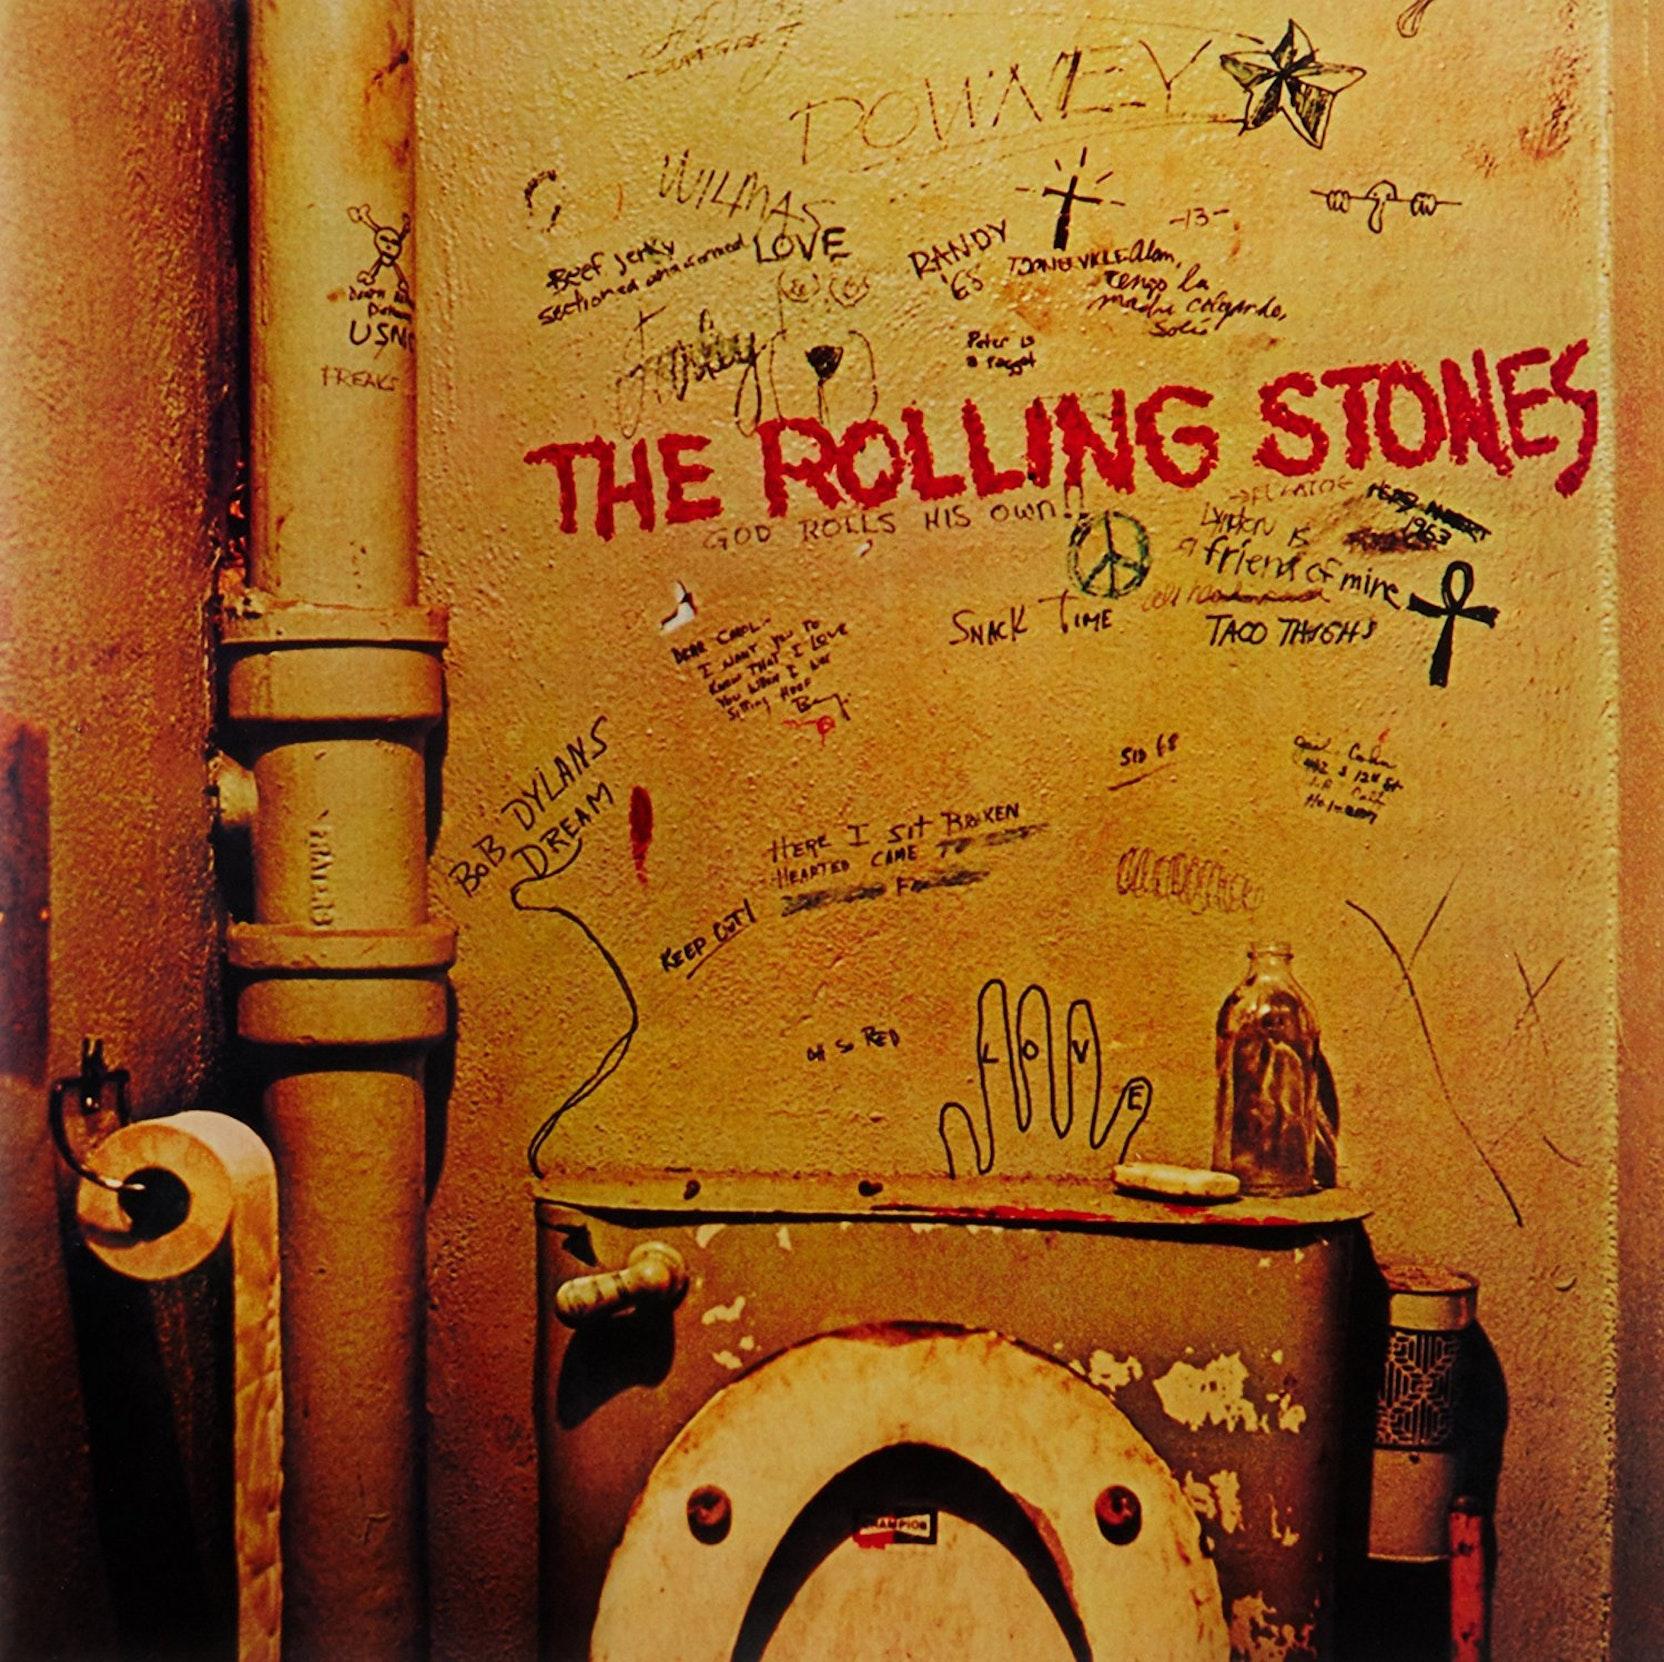 The 10 Best Rolling Stones Albums To Own On Vinyl — Vinyl Me